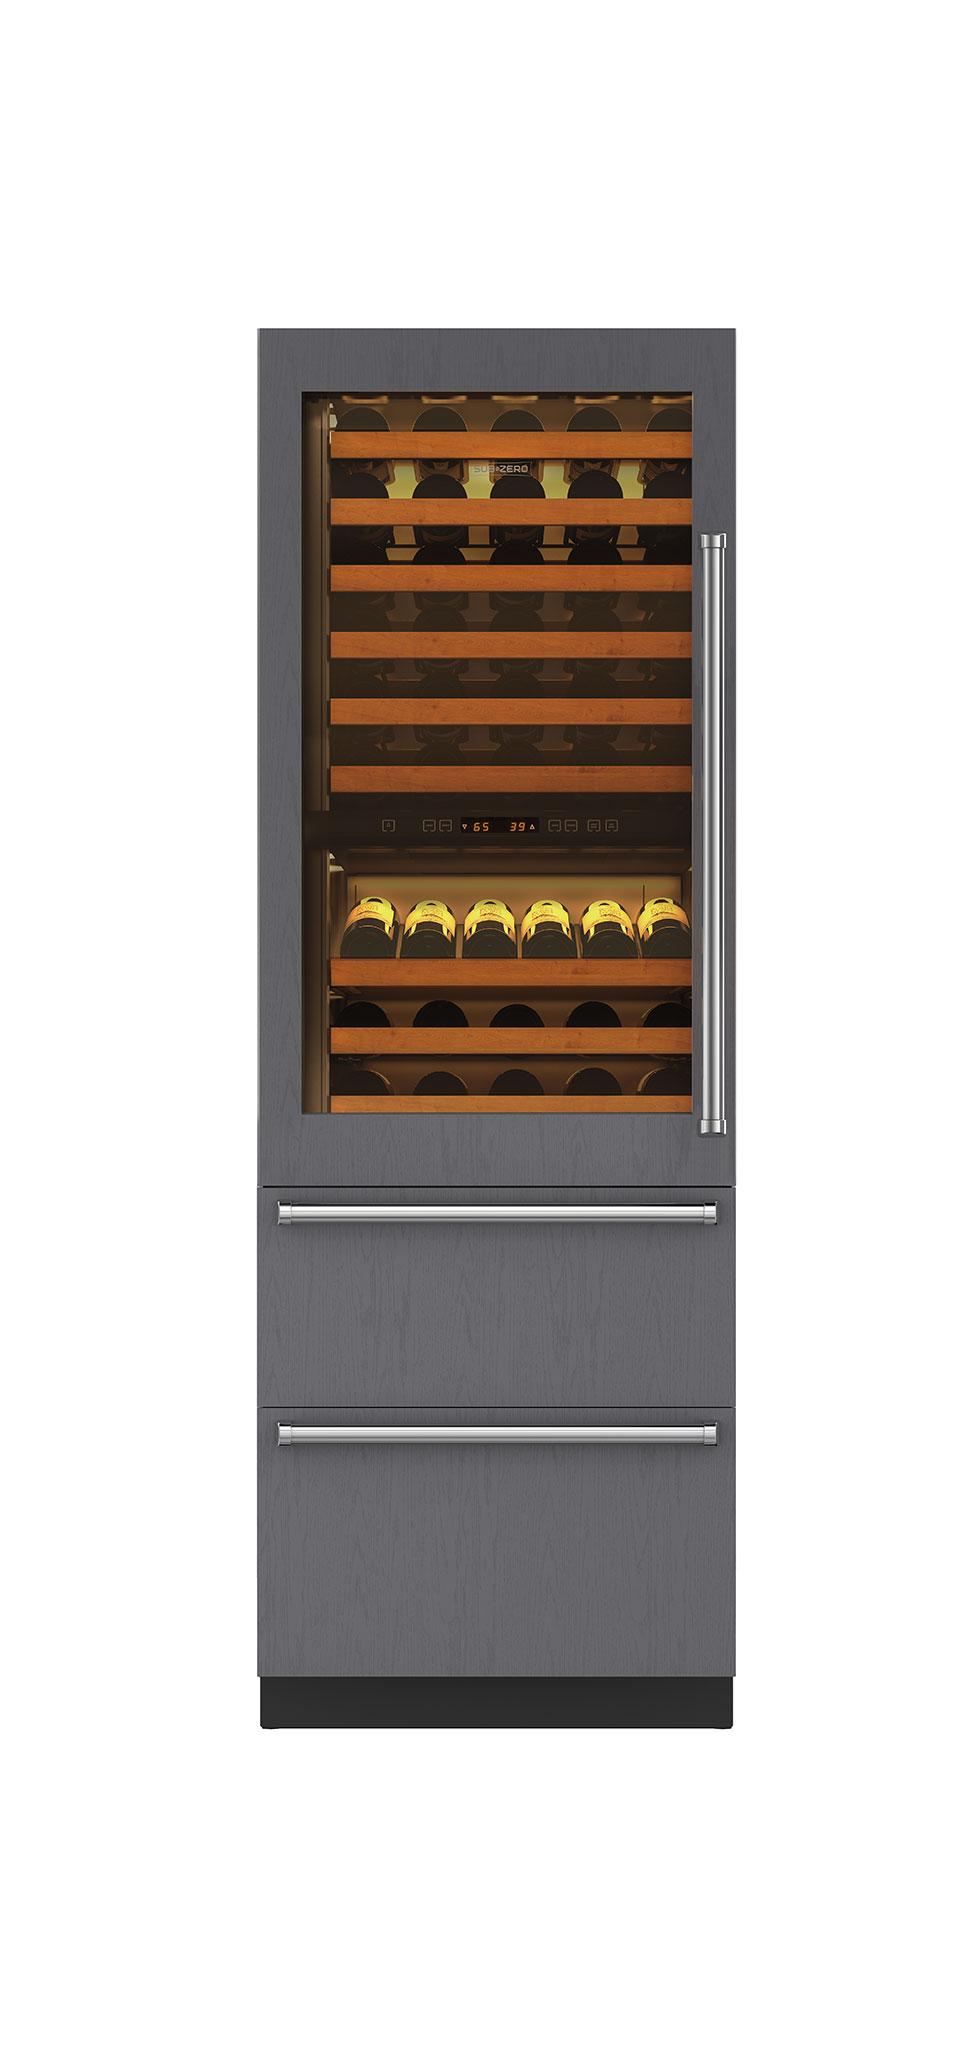 "Sub-Zero 27"" Integrated Wine Storage with Refrigerator Drawers - Panel Ready"